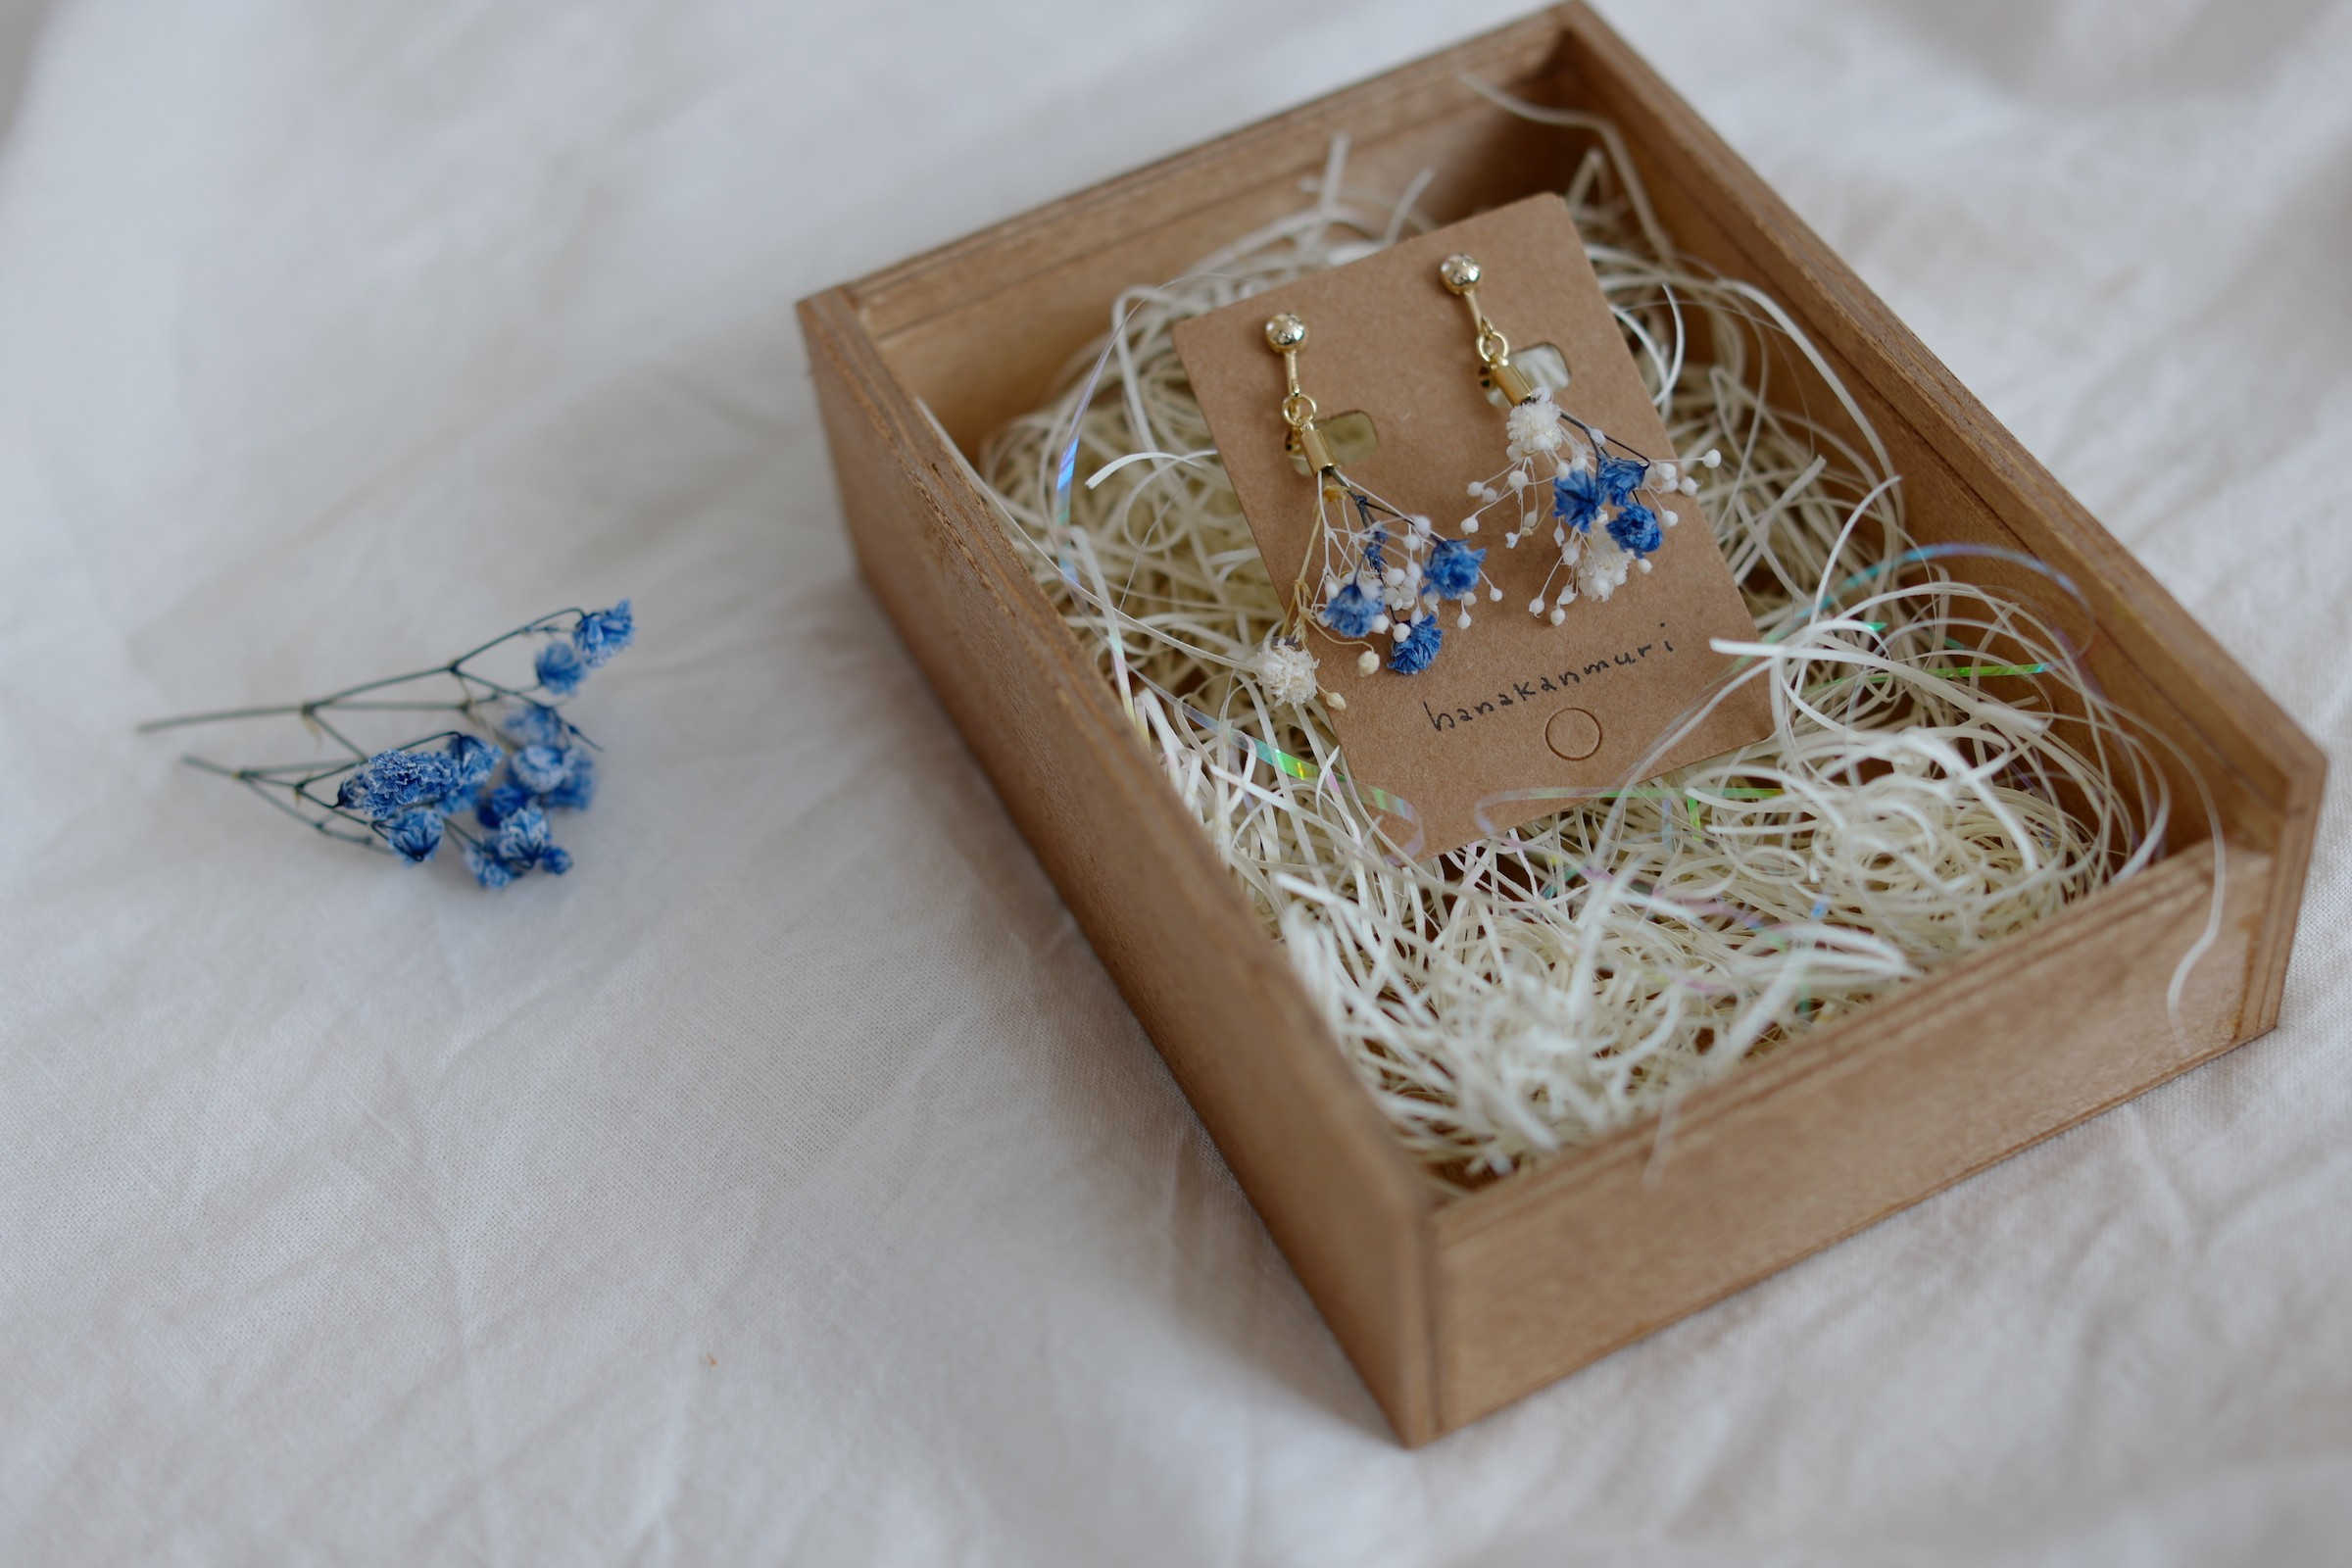 nemピアスのブルーのケース入り写真